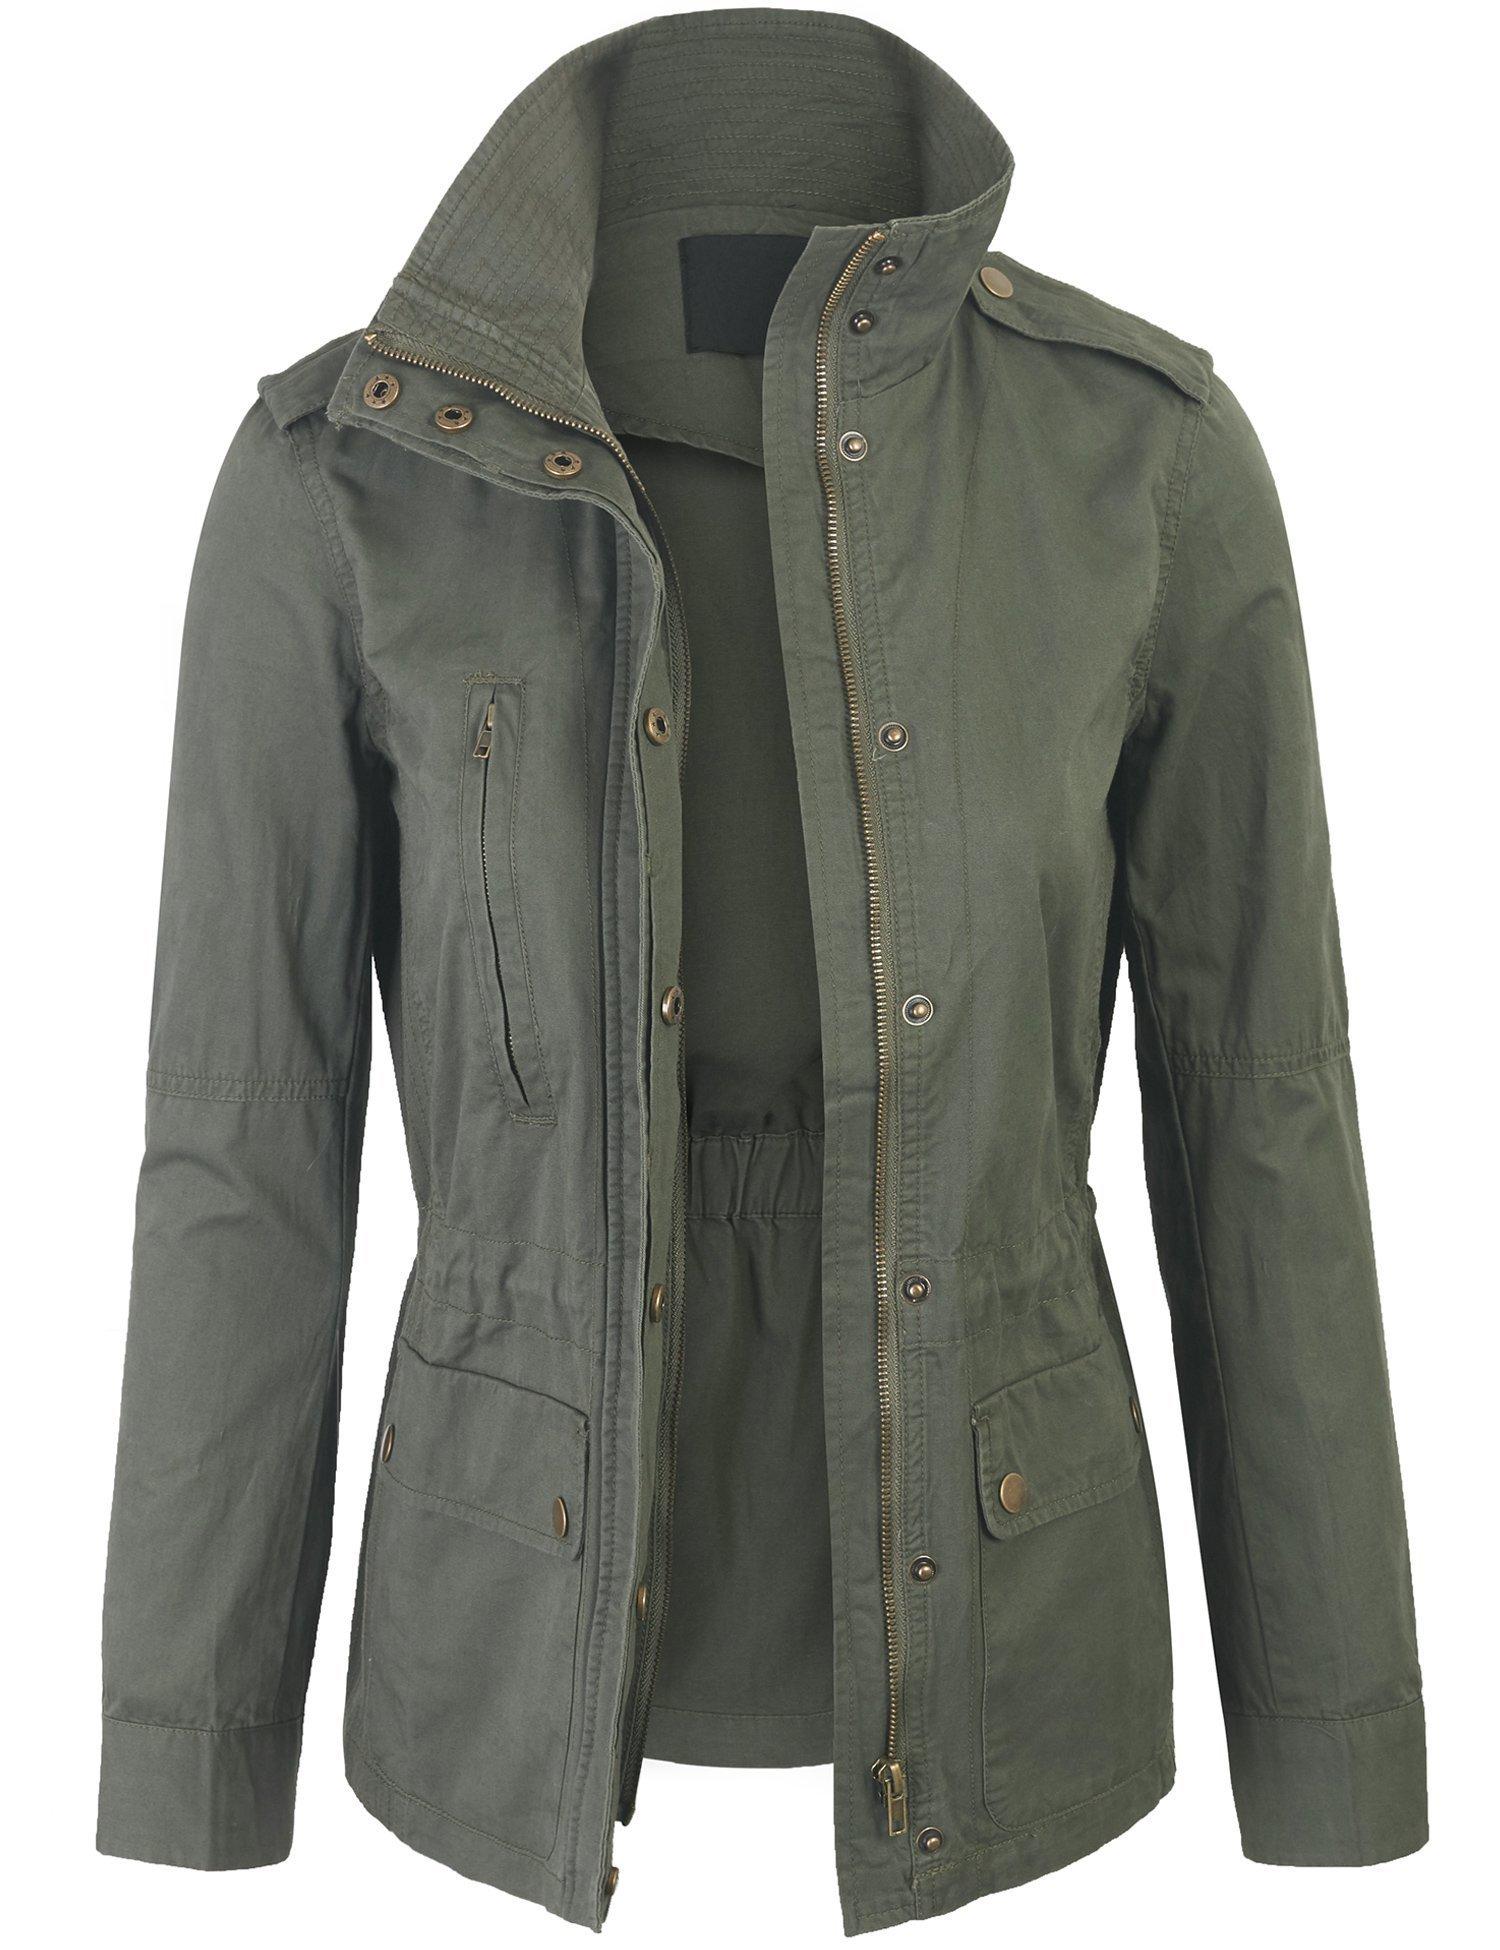 KOGMO Womens Military Anorak Safari Jacket with Elastic Waist Band-M-Olive